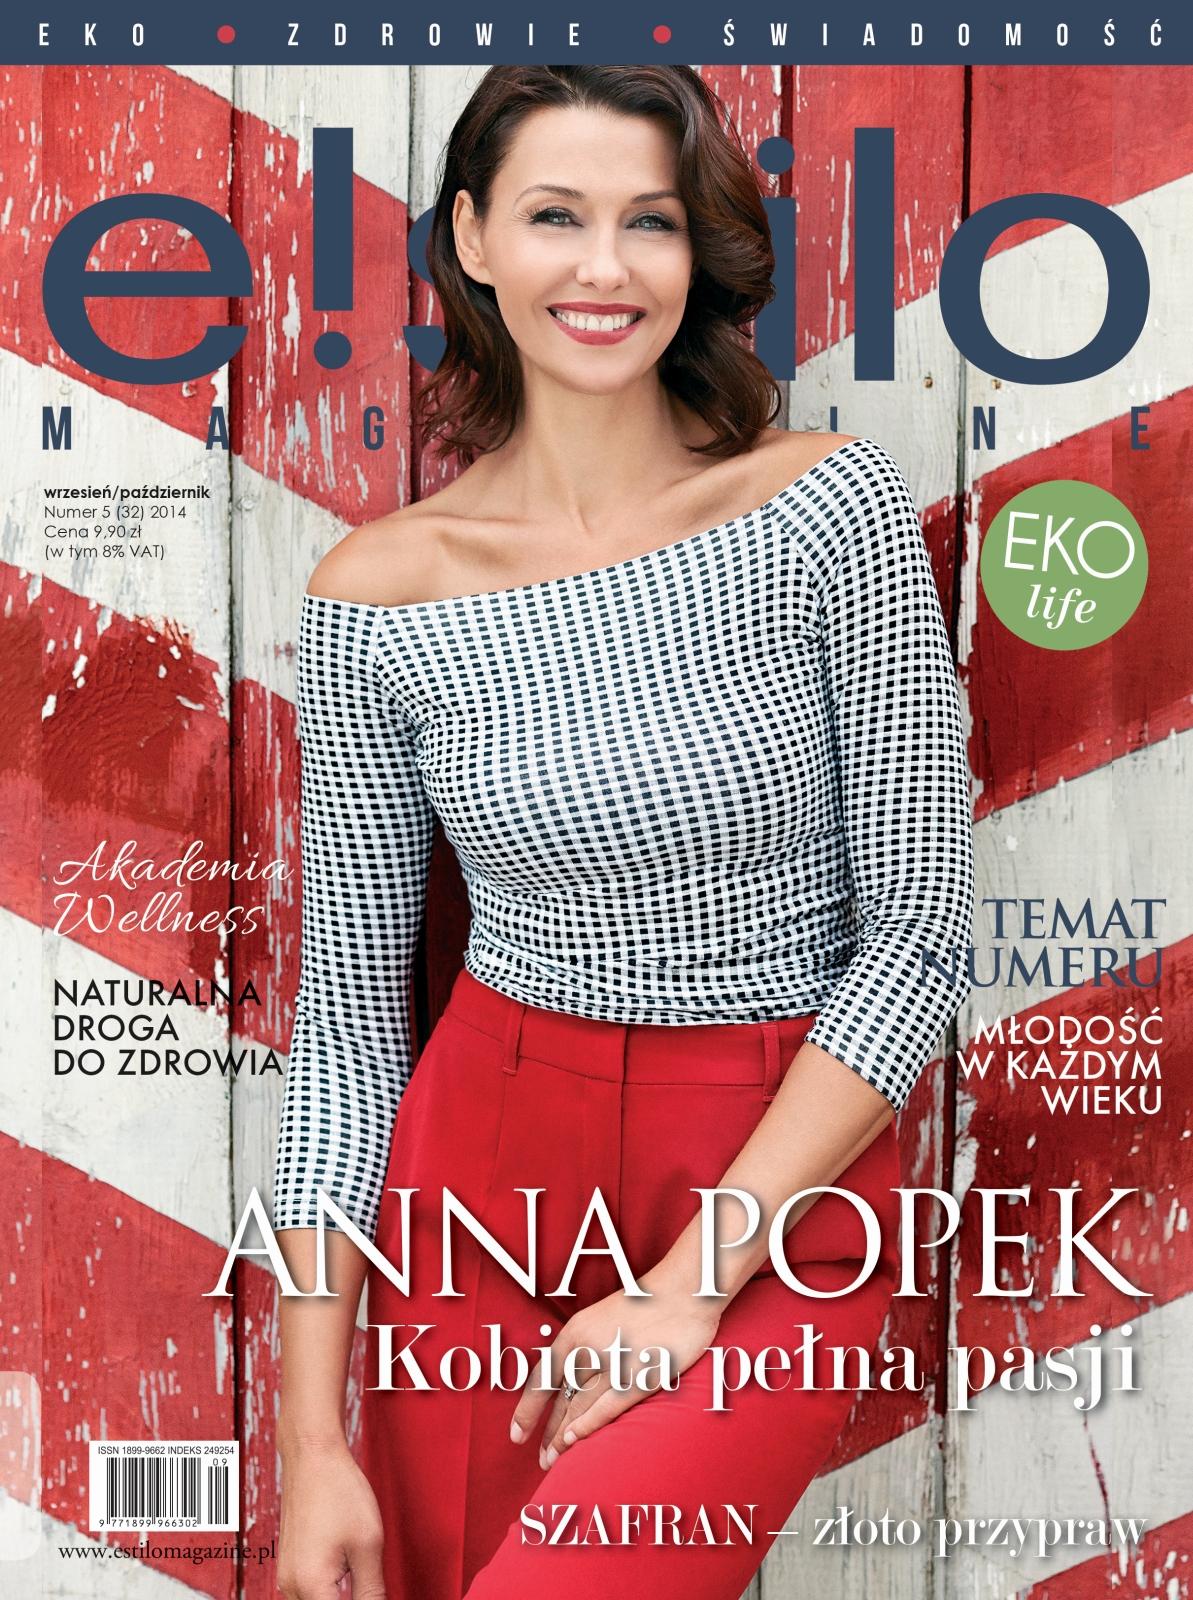 Anna_Popek_wywiad+okladka-1